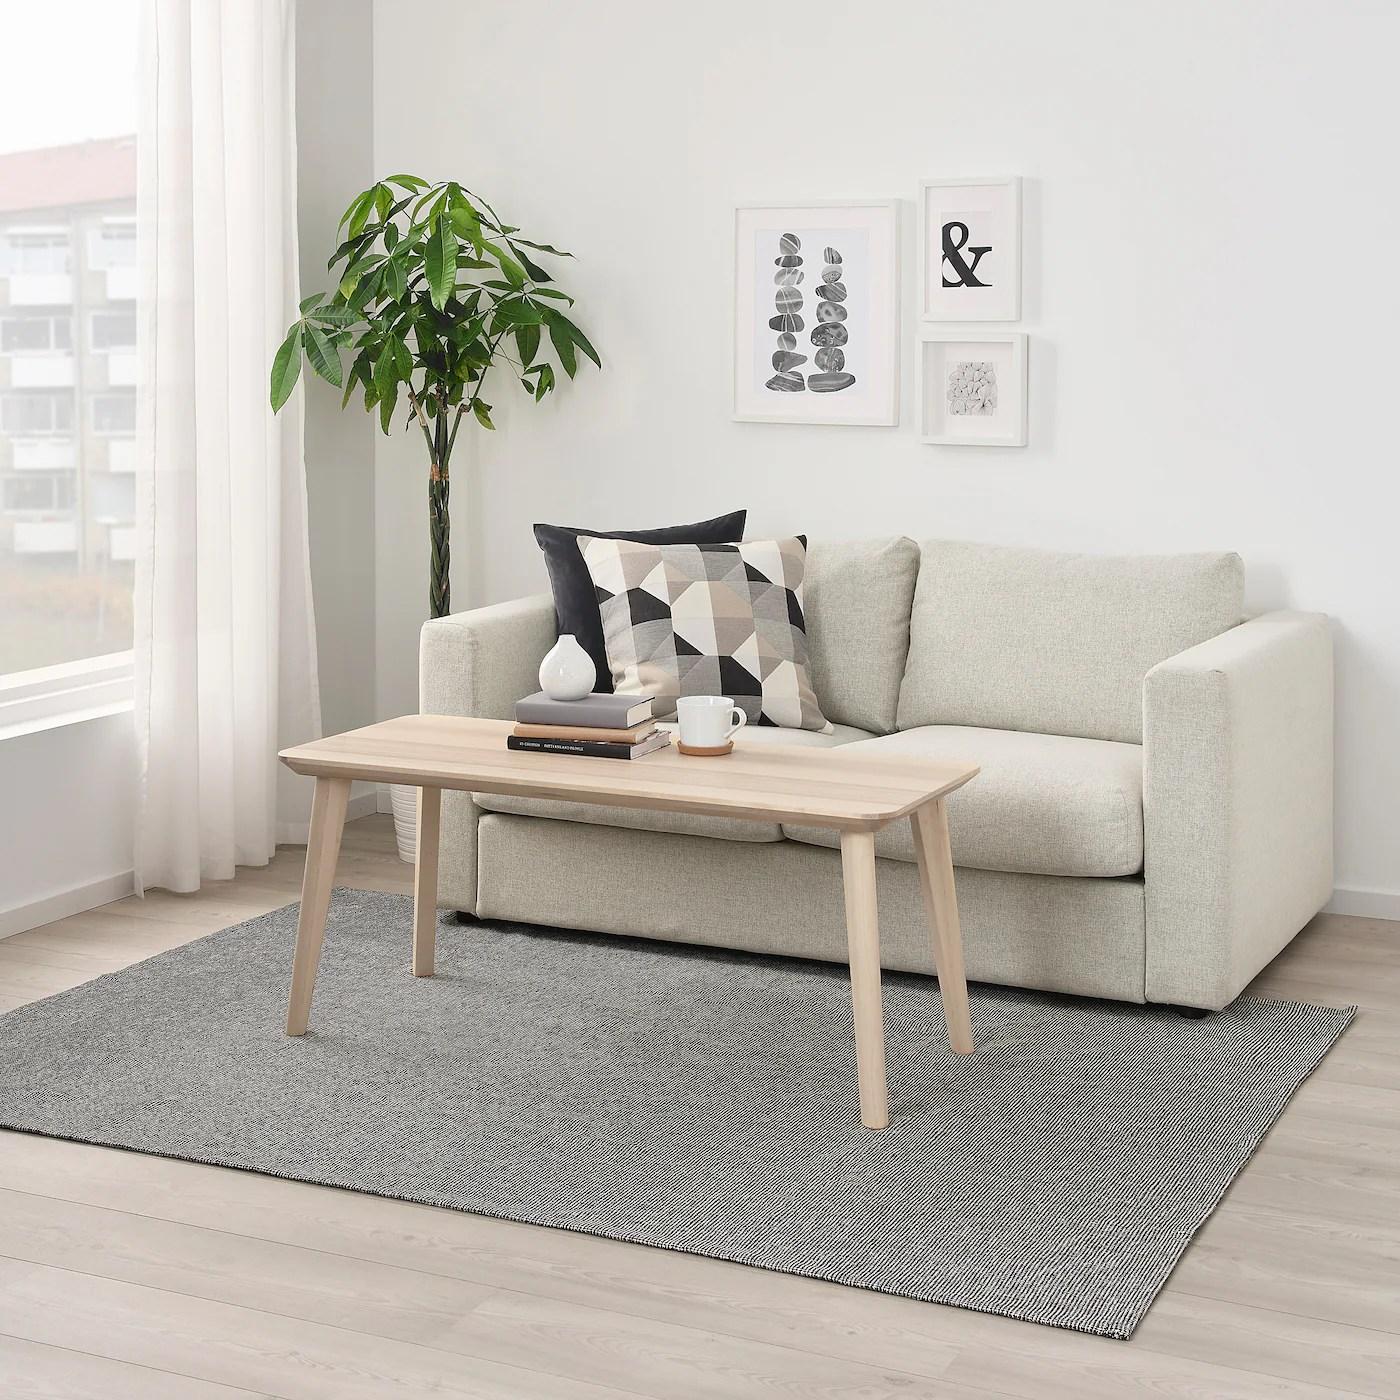 Tiphede Matta Slatvavd Gra Vit 155x220 Cm Ikea